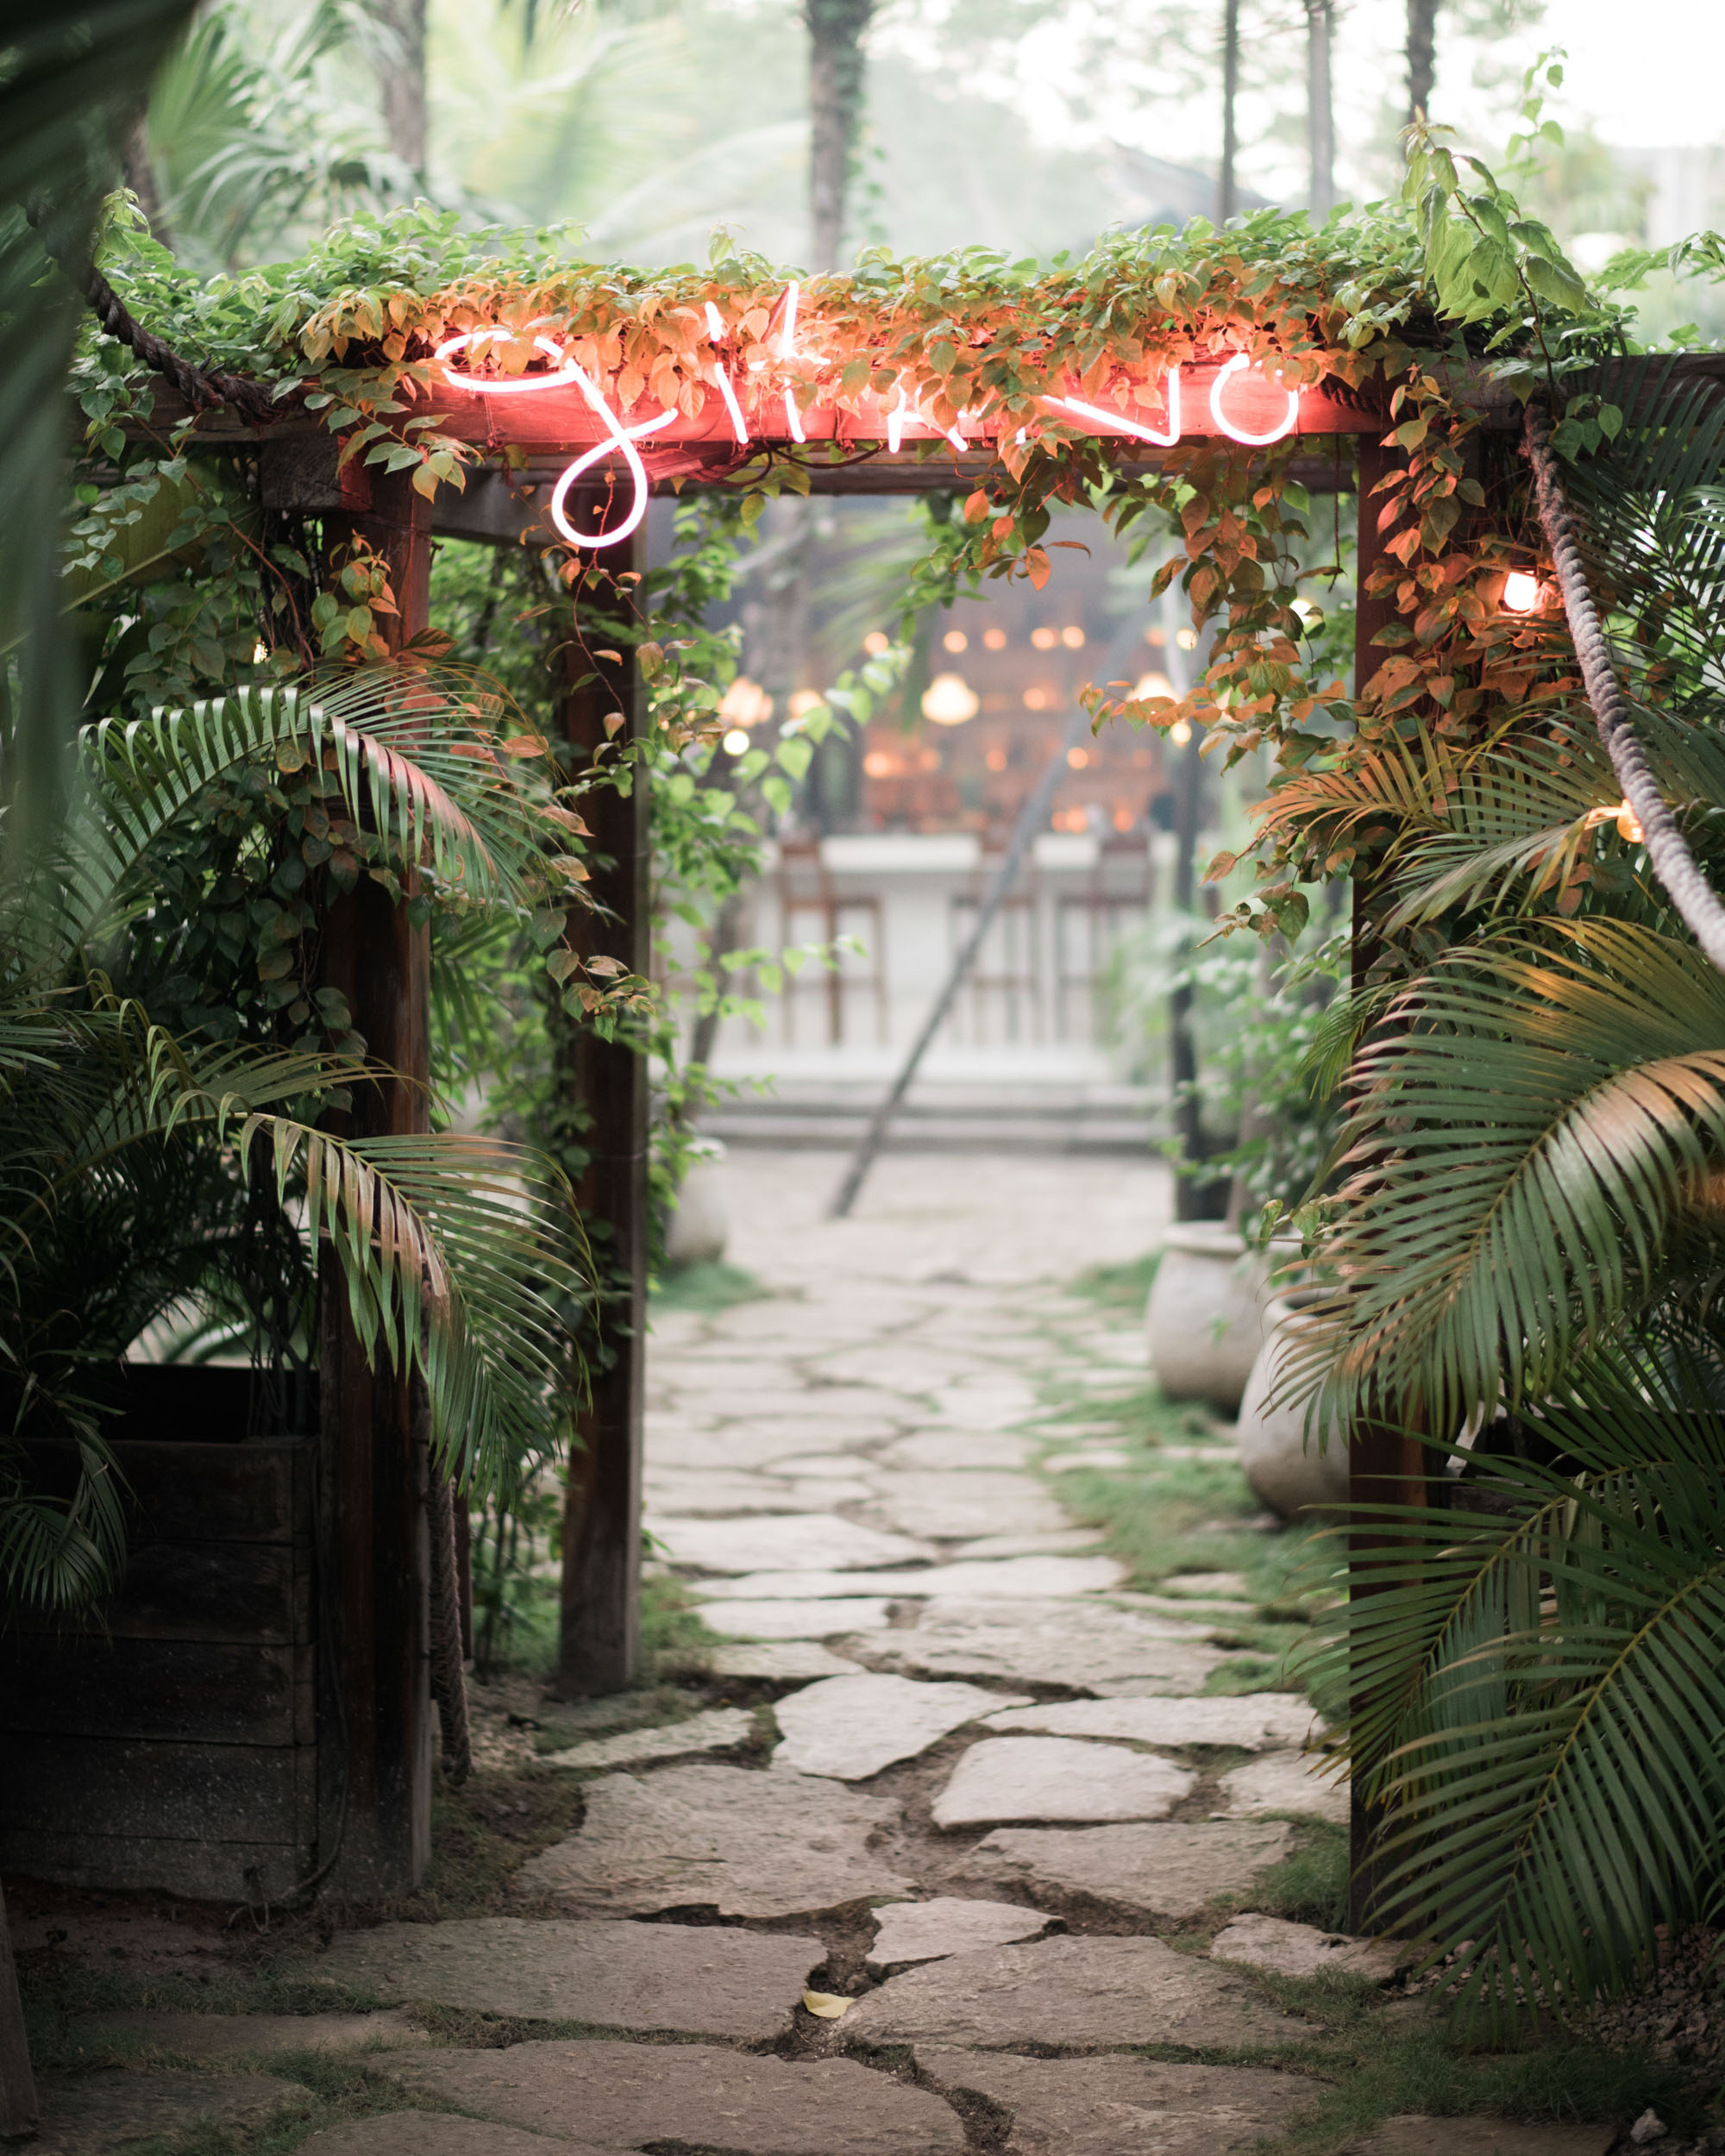 Gitano Tulum Mexico Destination Wedding Photographer 2 - Gitano Tulum